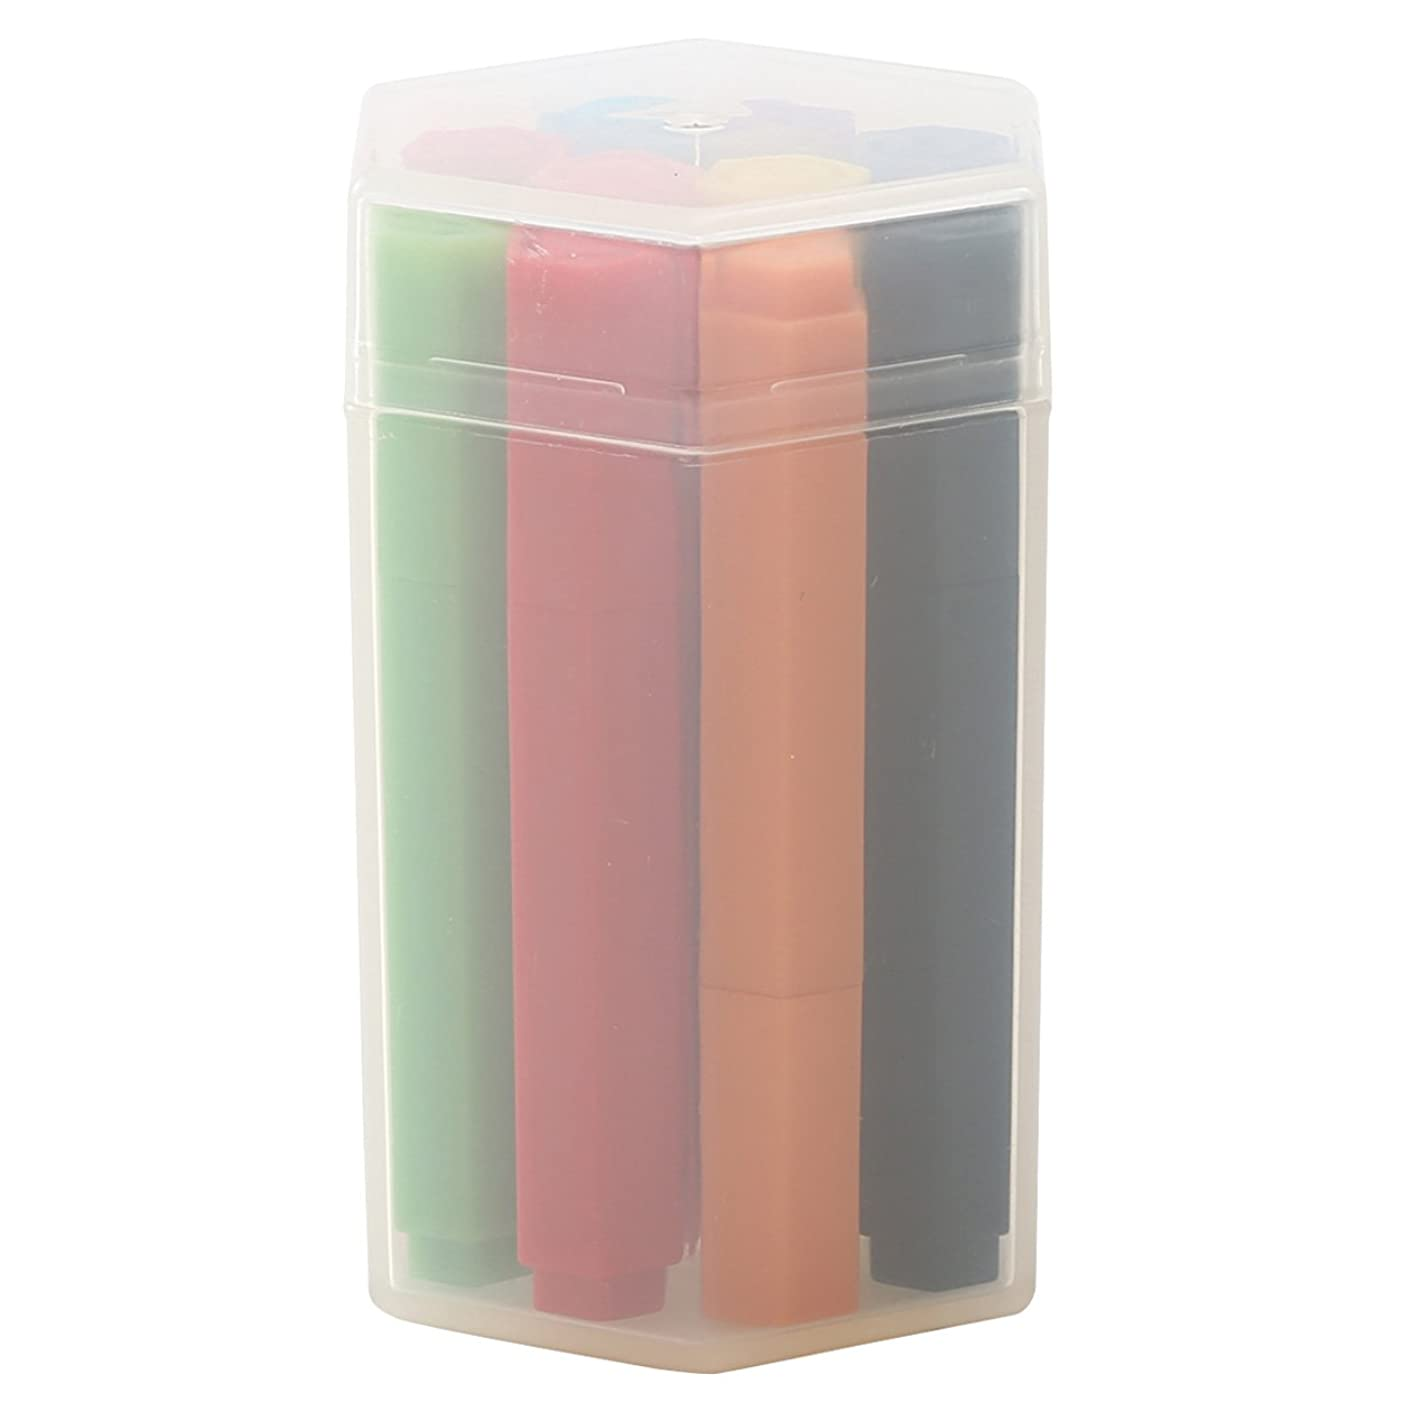 Muji Mini Size Hexagonal Aqueous Ink Pen, 10 Colors Set in Tube eflzuotj78441928